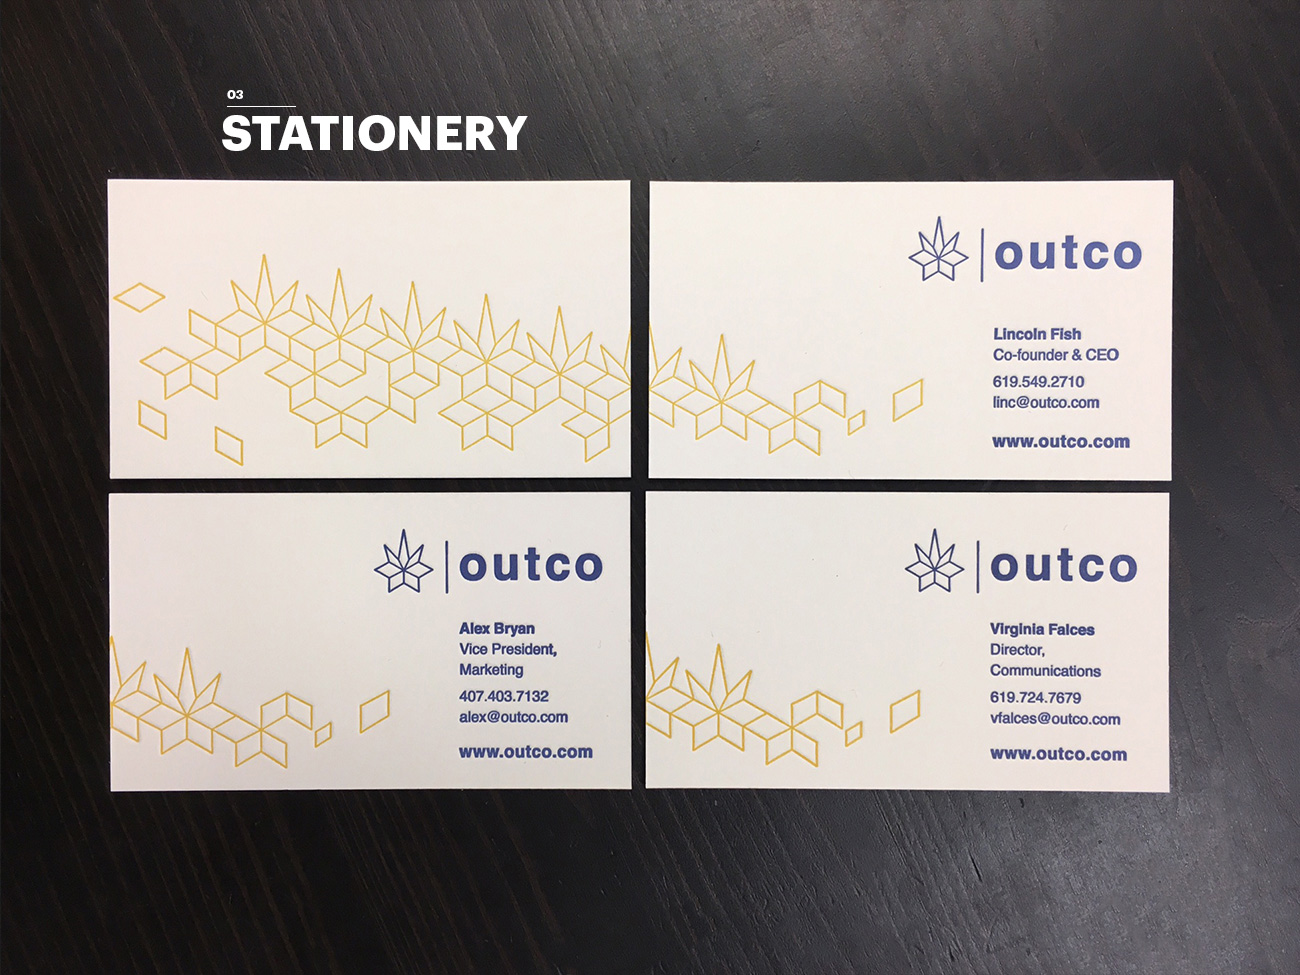 Outco Business Card Designs